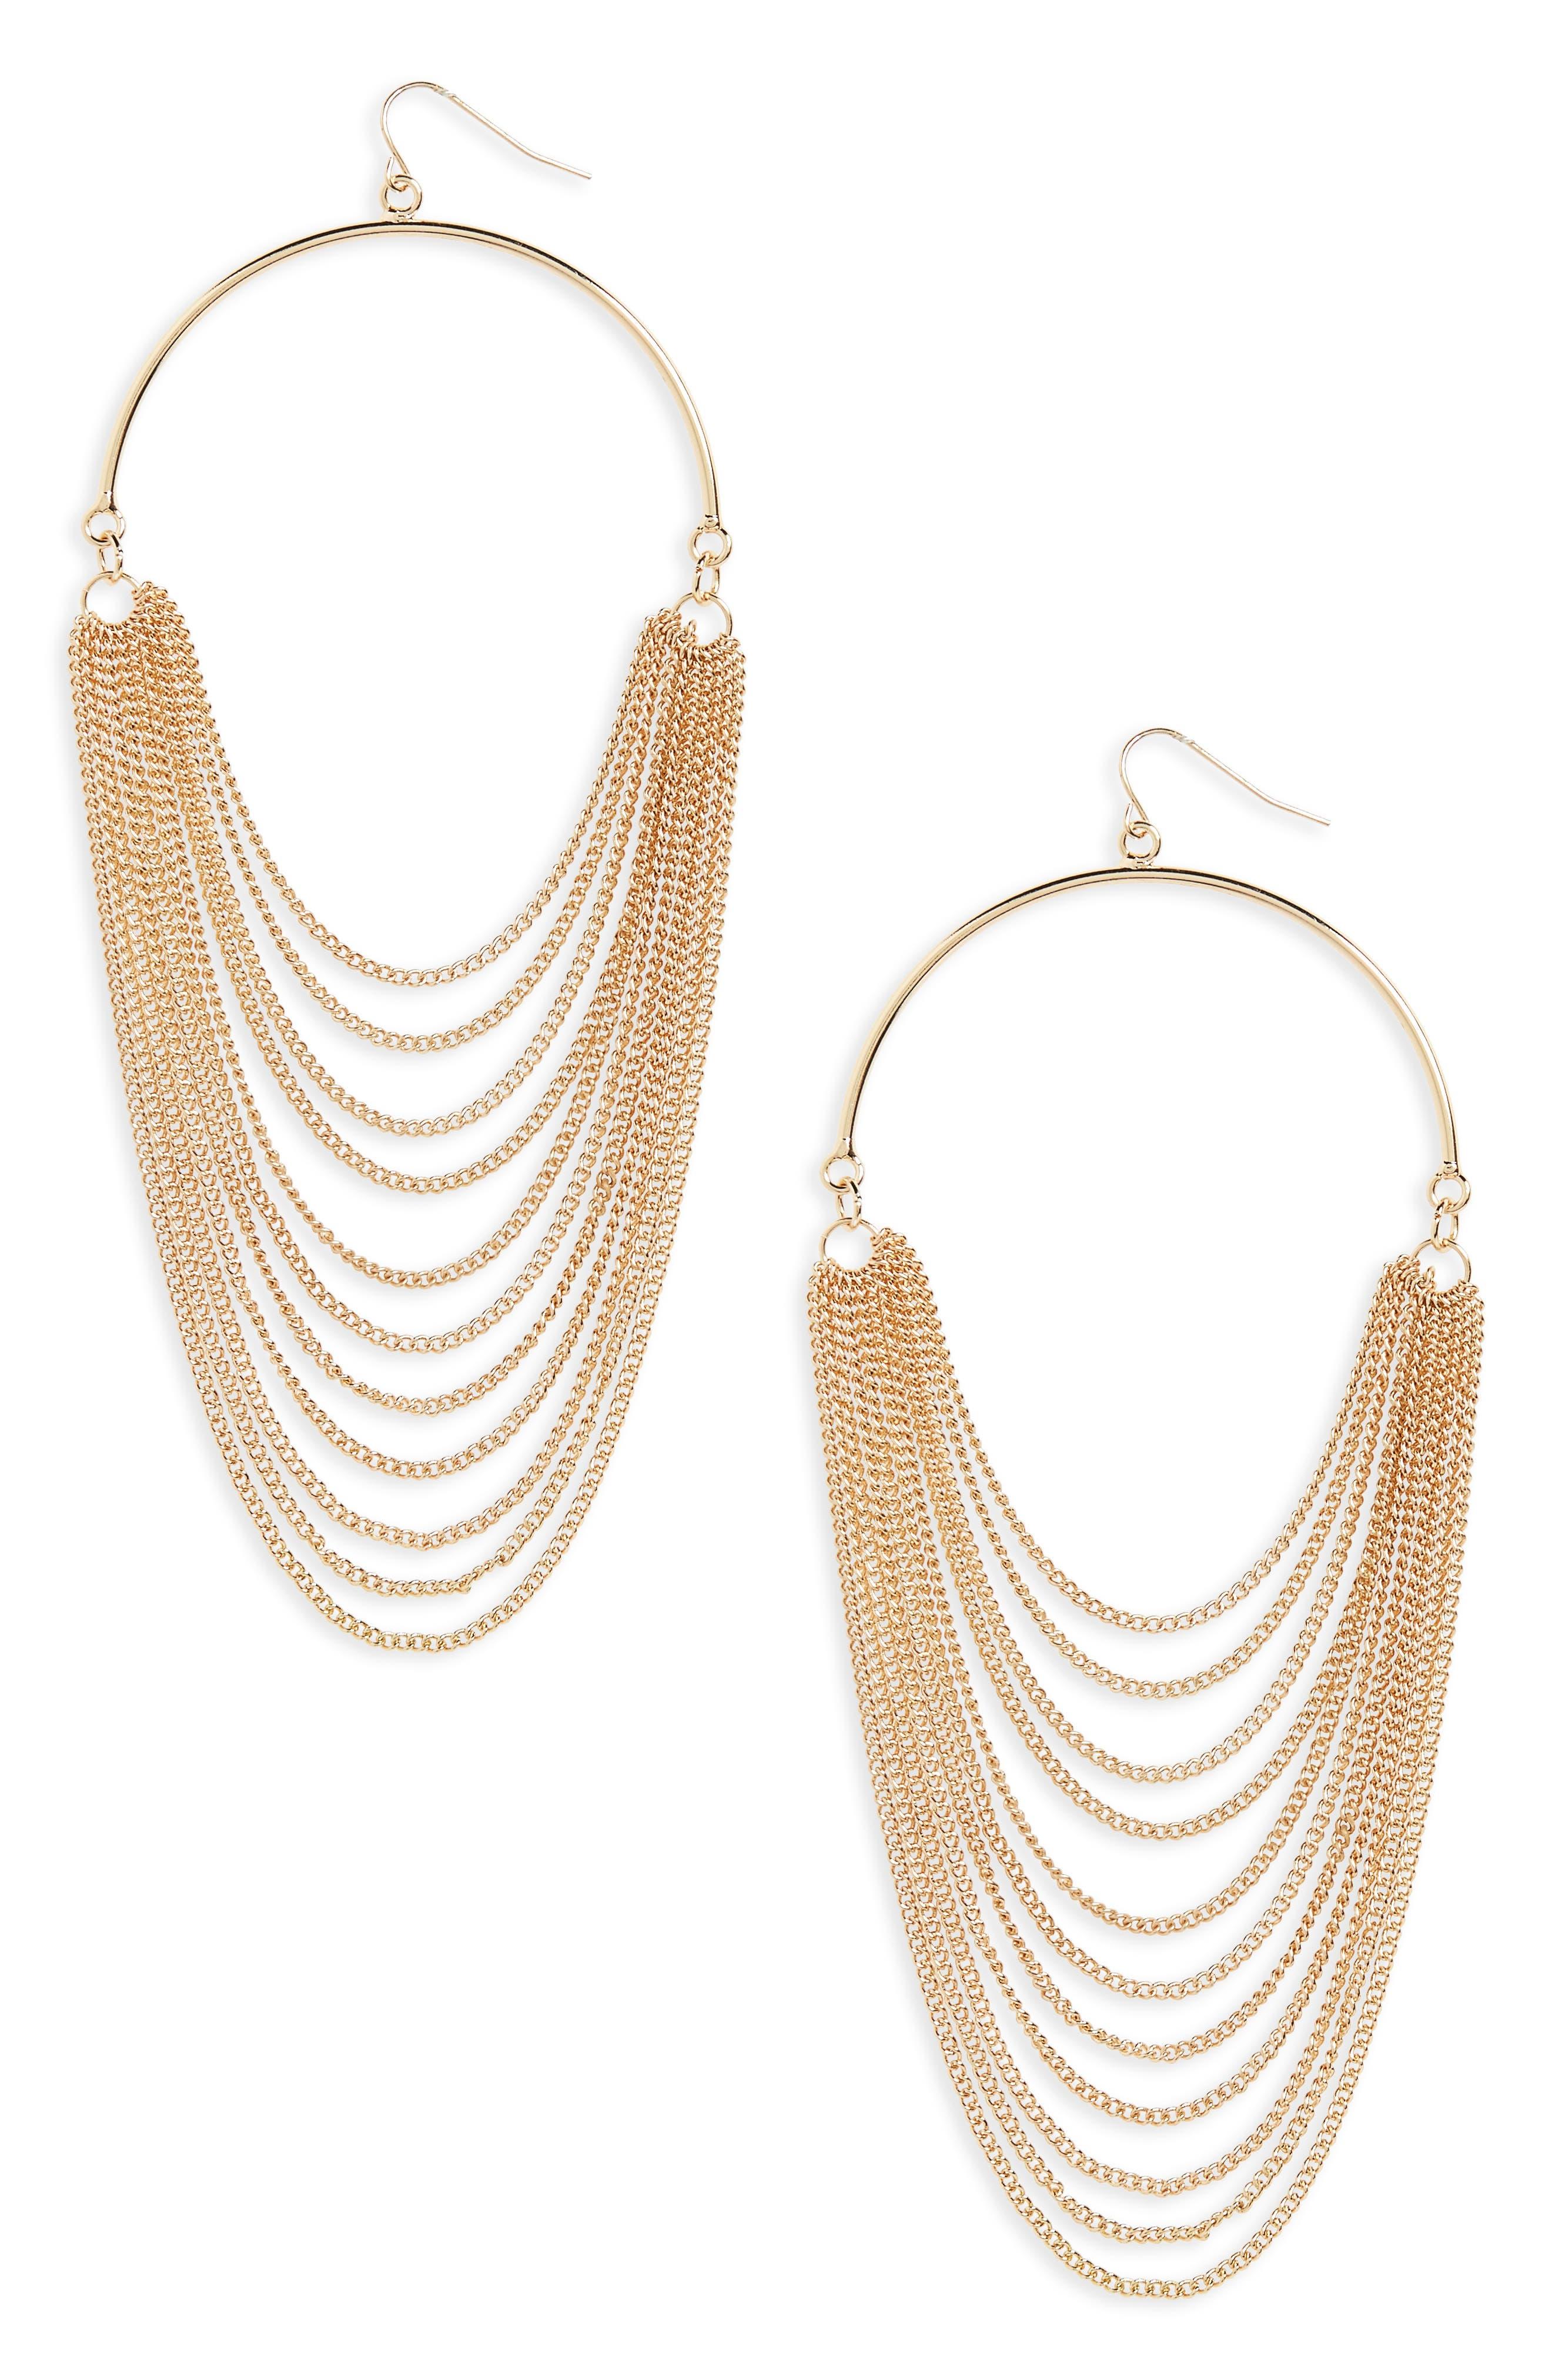 Alternate Image 1 Selected - Natasha Layered Chain Hoop Earrings